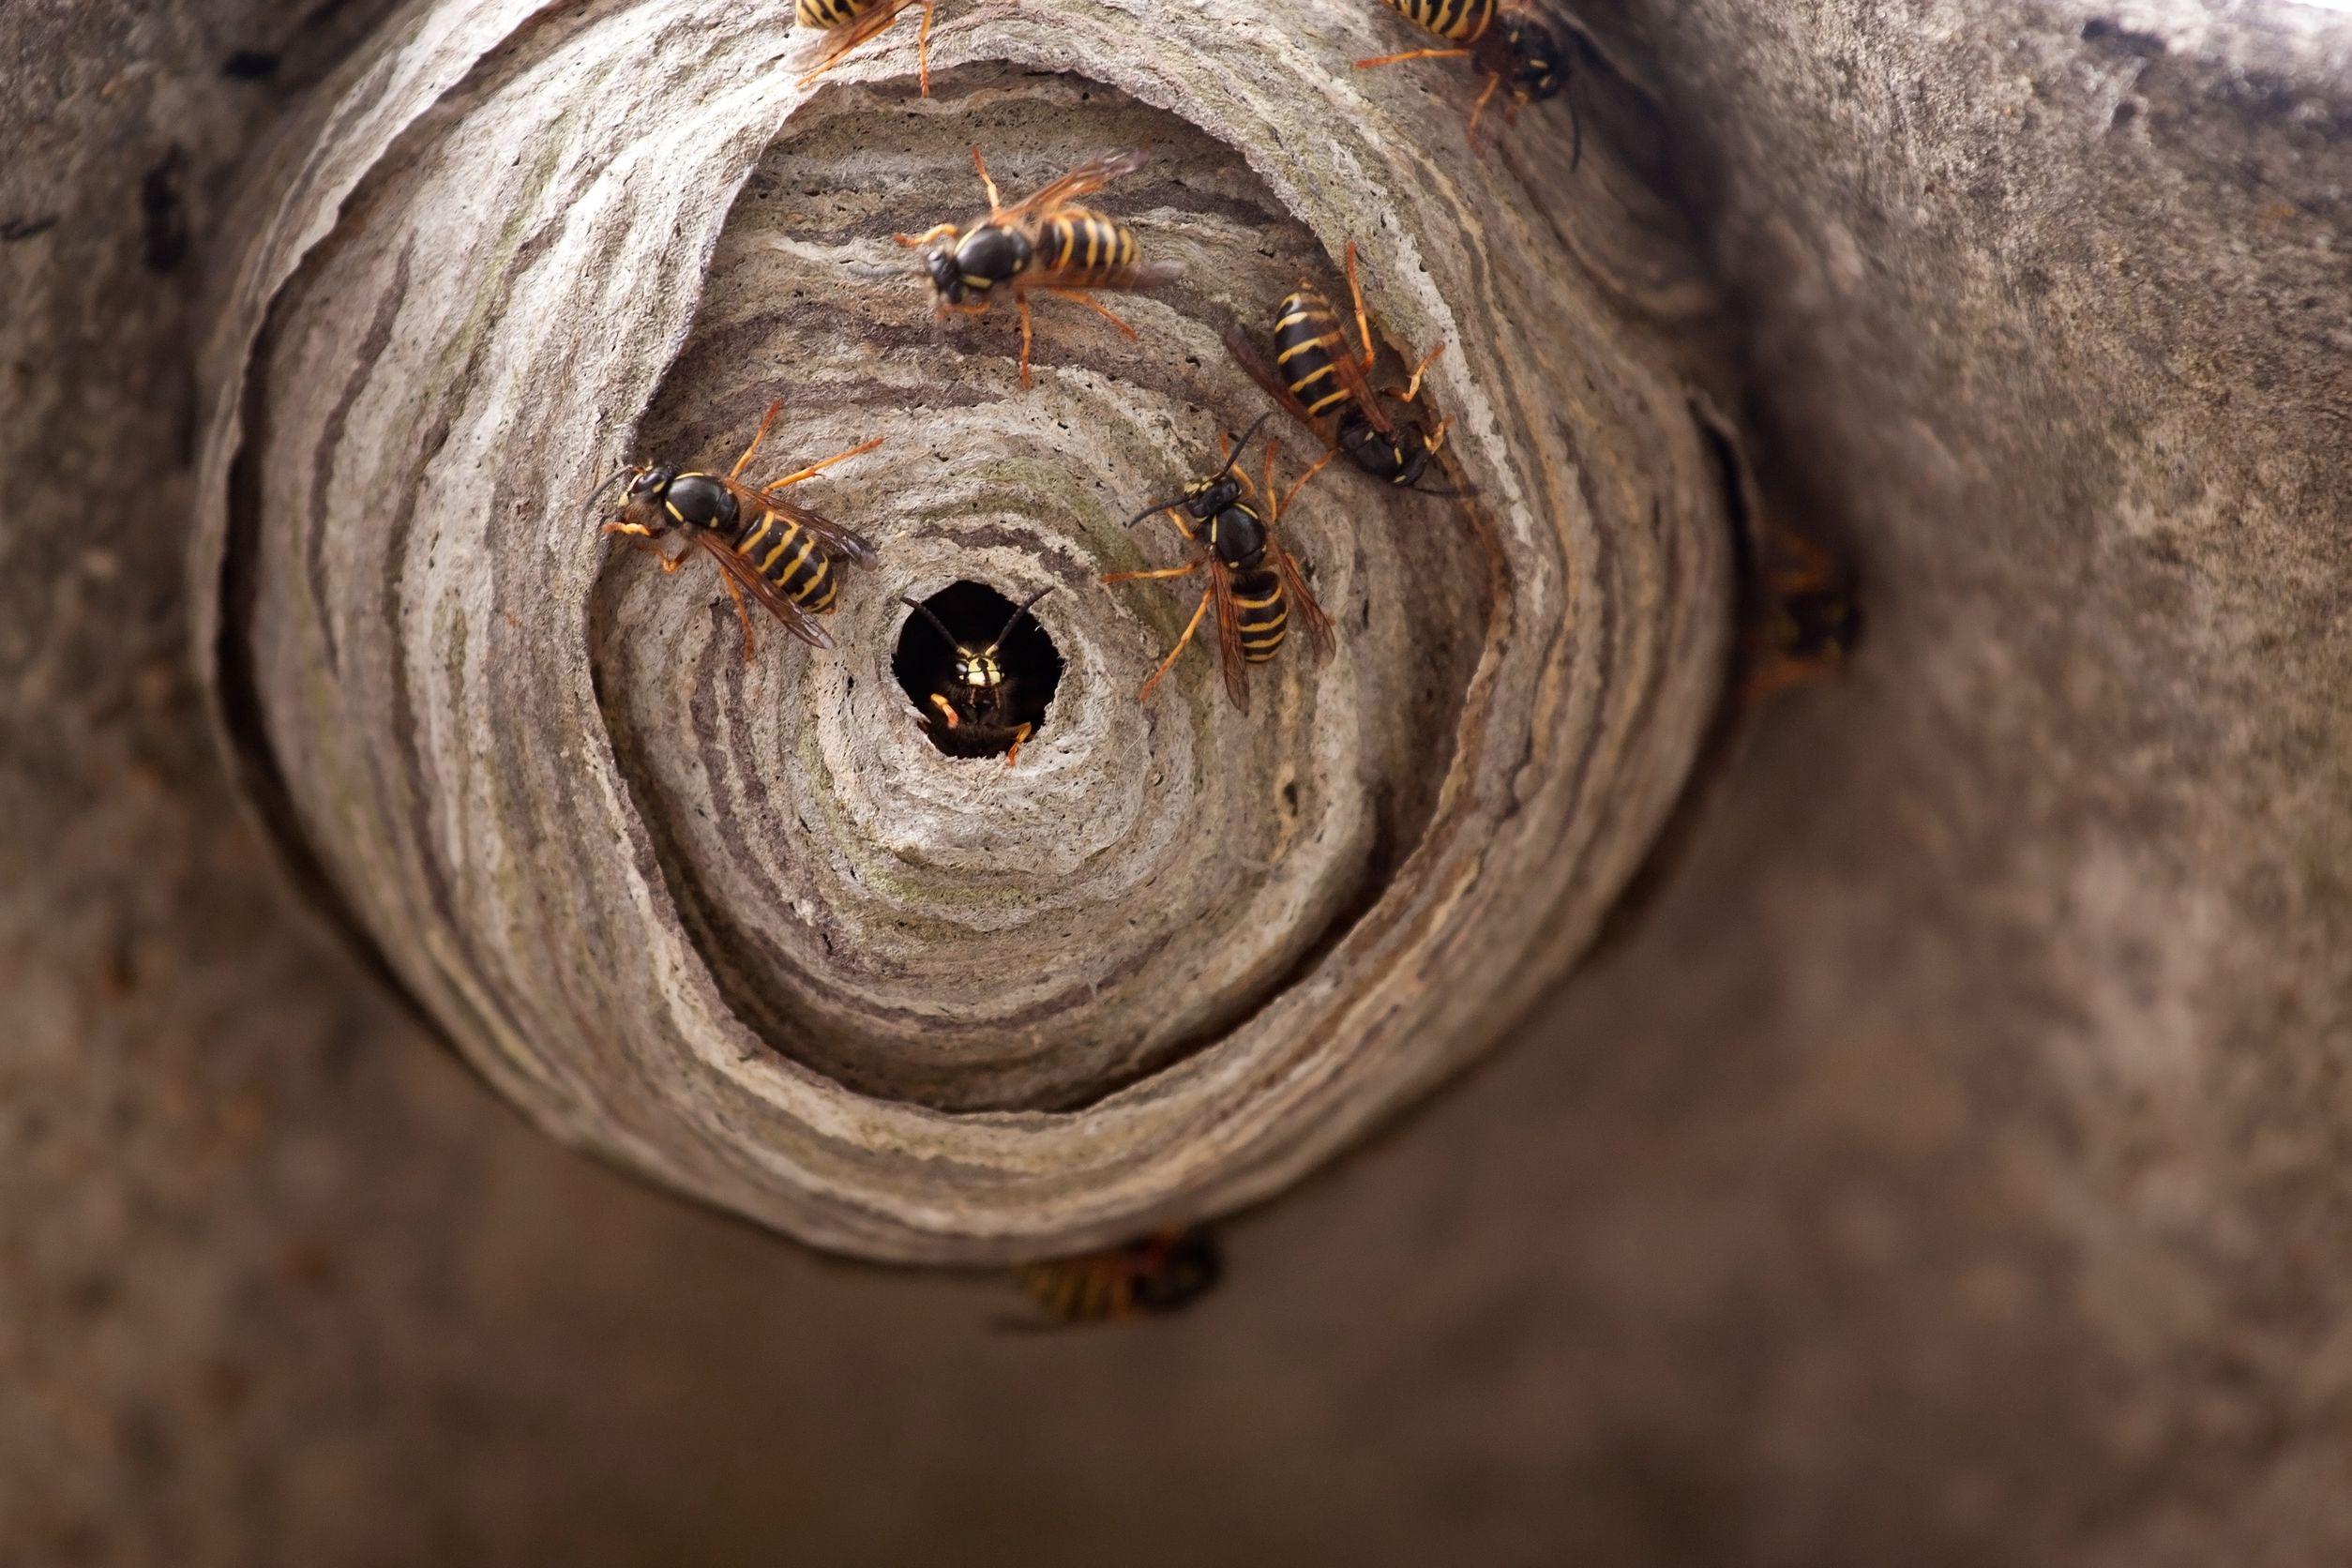 wespenbestrijding, wespen bestrijding, wespen bestrijden, ongediertebestrijding, ongedierte bestrijden, ongedierte bestrijding